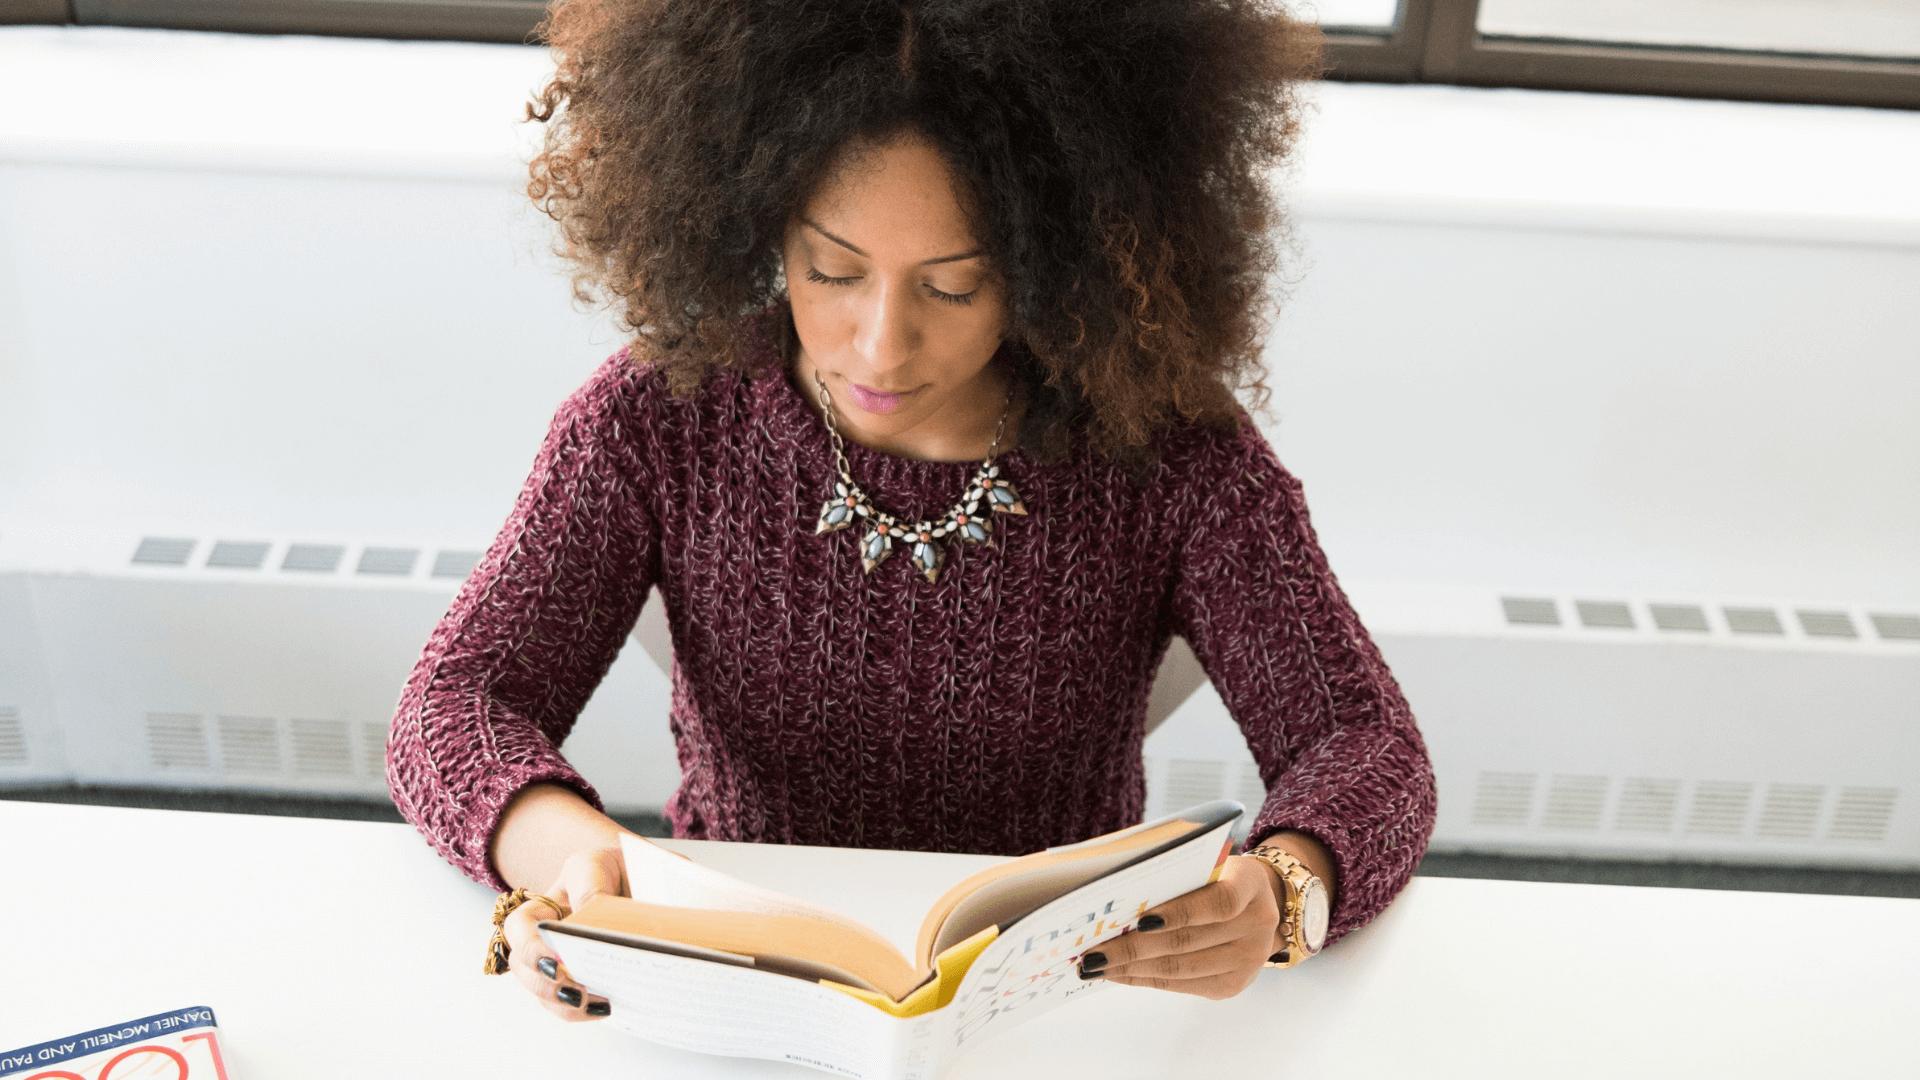 A black woman reading a book